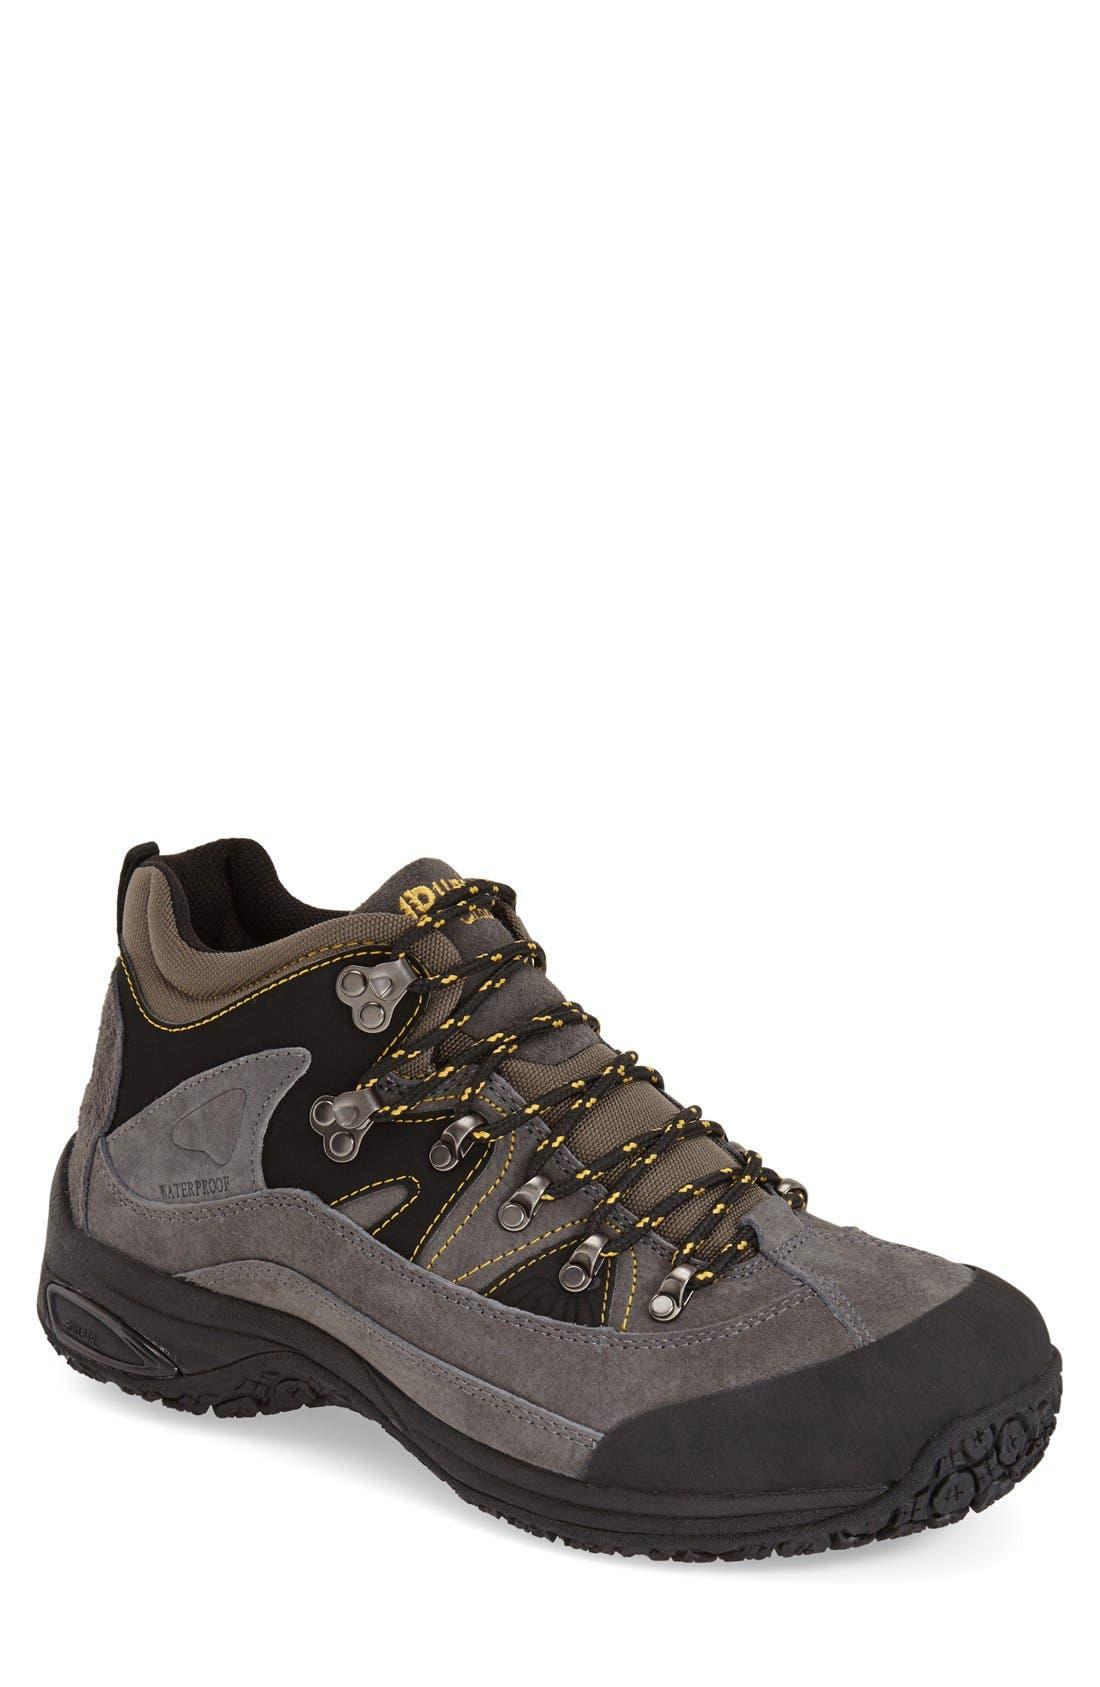 Dunham 'Cloud' Waterproof Hiking Boot (Men)